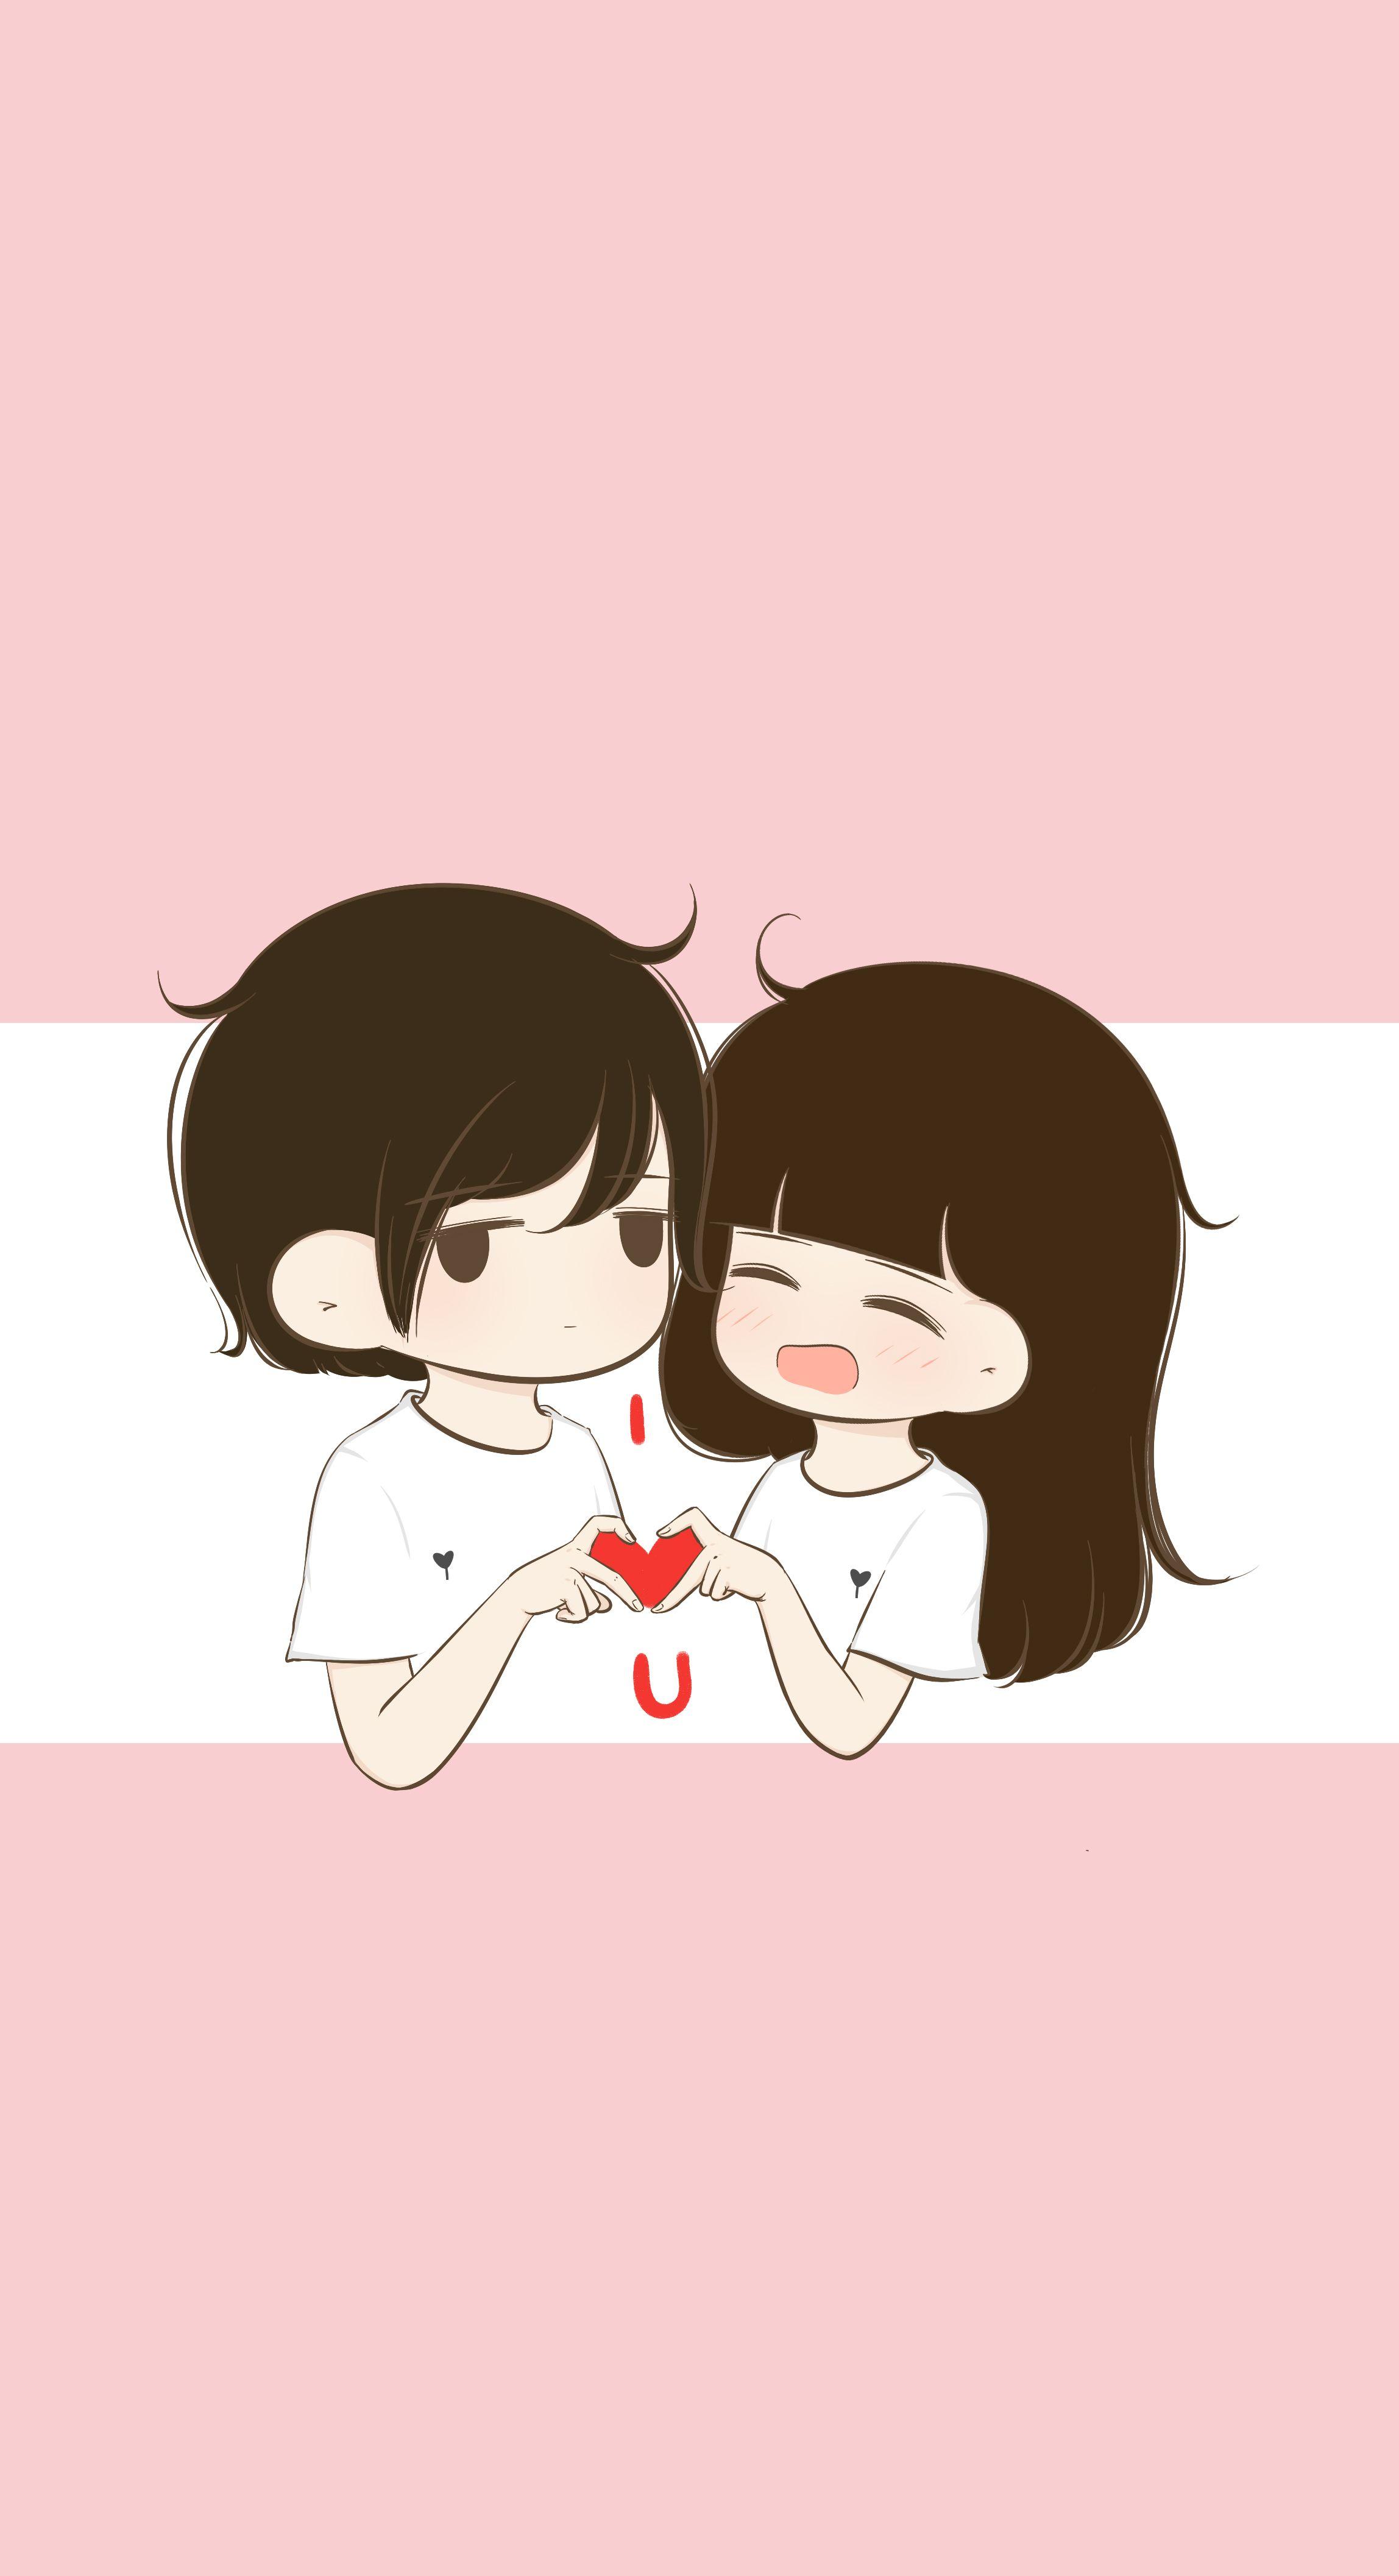 Pin Oleh Hạ Băng Di Profilepictures Seni Anime Pasangan Animasi Seni